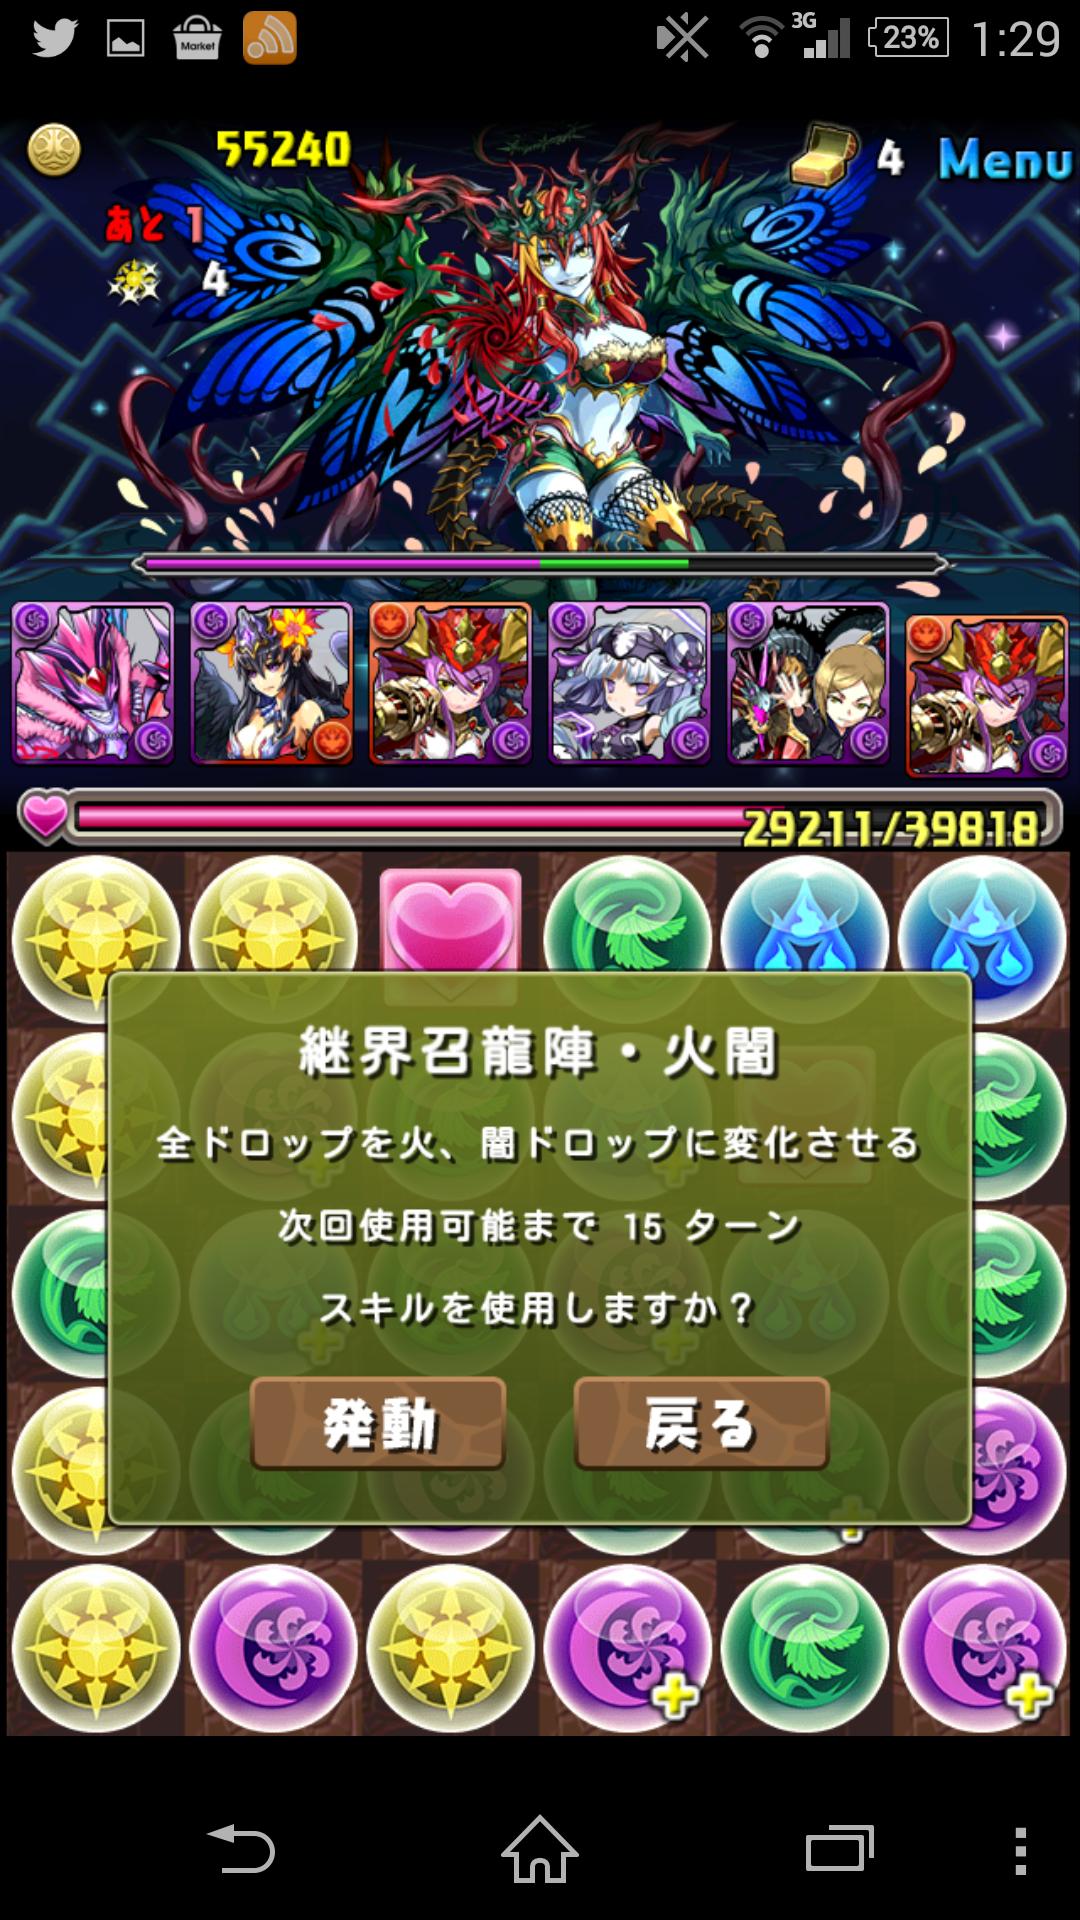 Screenshot_2014-12-19-01-29-16.png